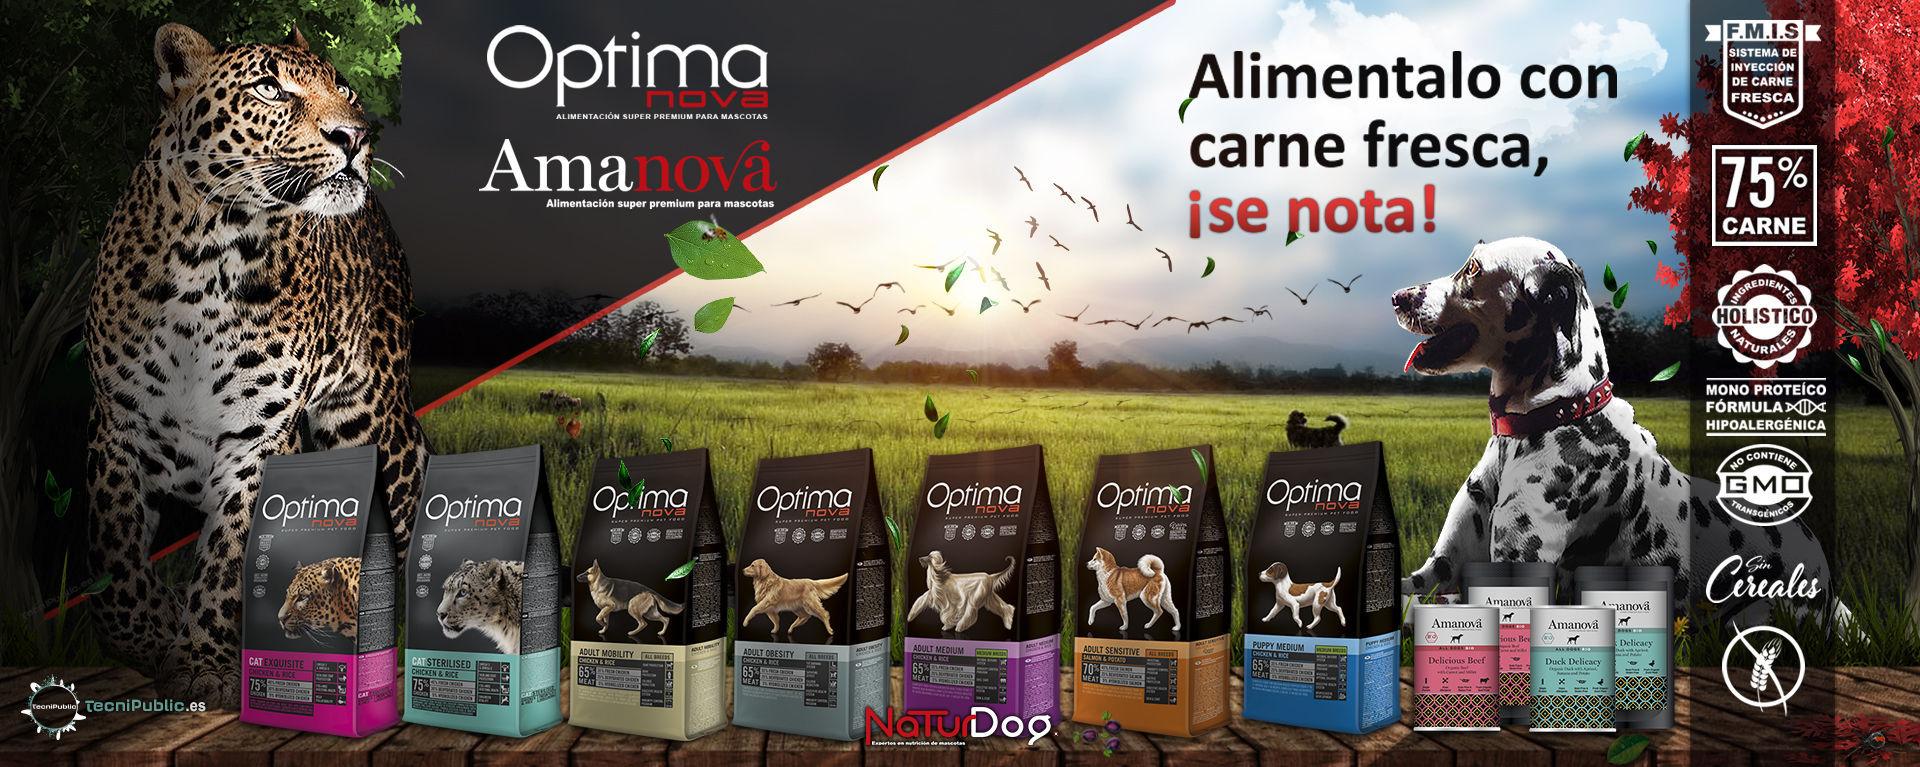 Optimanova-Amanova-alimentacion-seca-humeda-perros-gatos-NaturDog-designed-by-TecniPublic.es.jpg?1.1.1